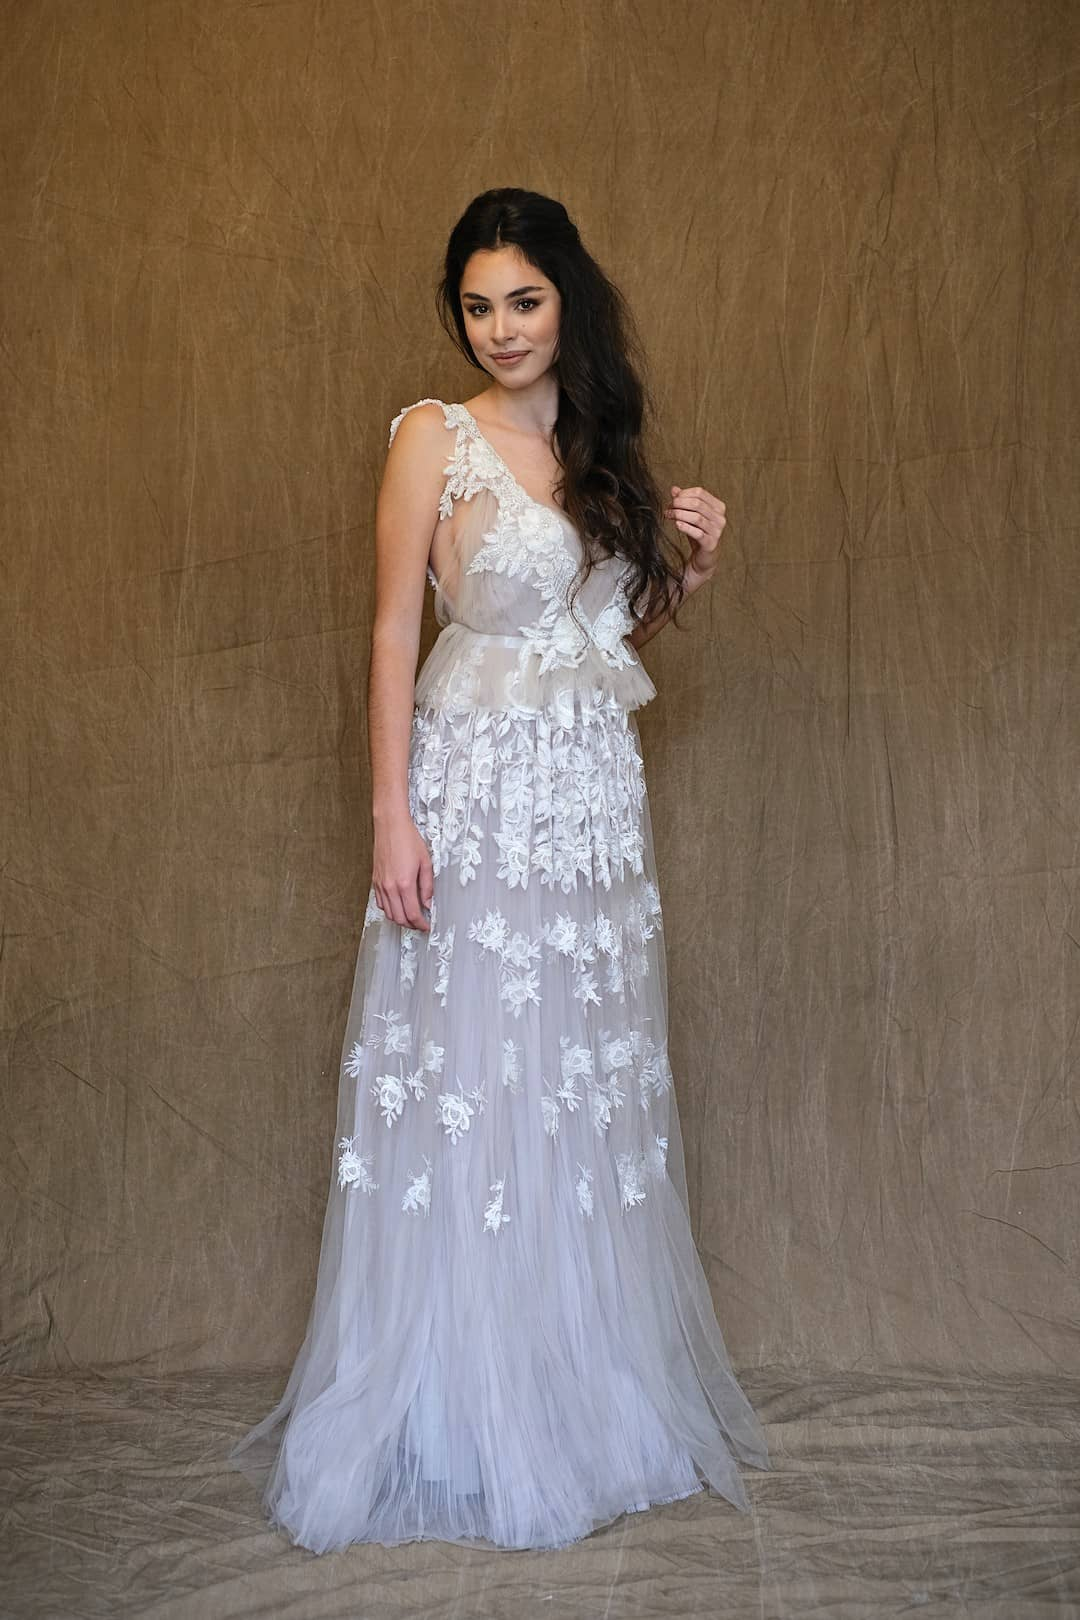 Romantic wedding dress - Marco&Maria - 2017-1018 - front